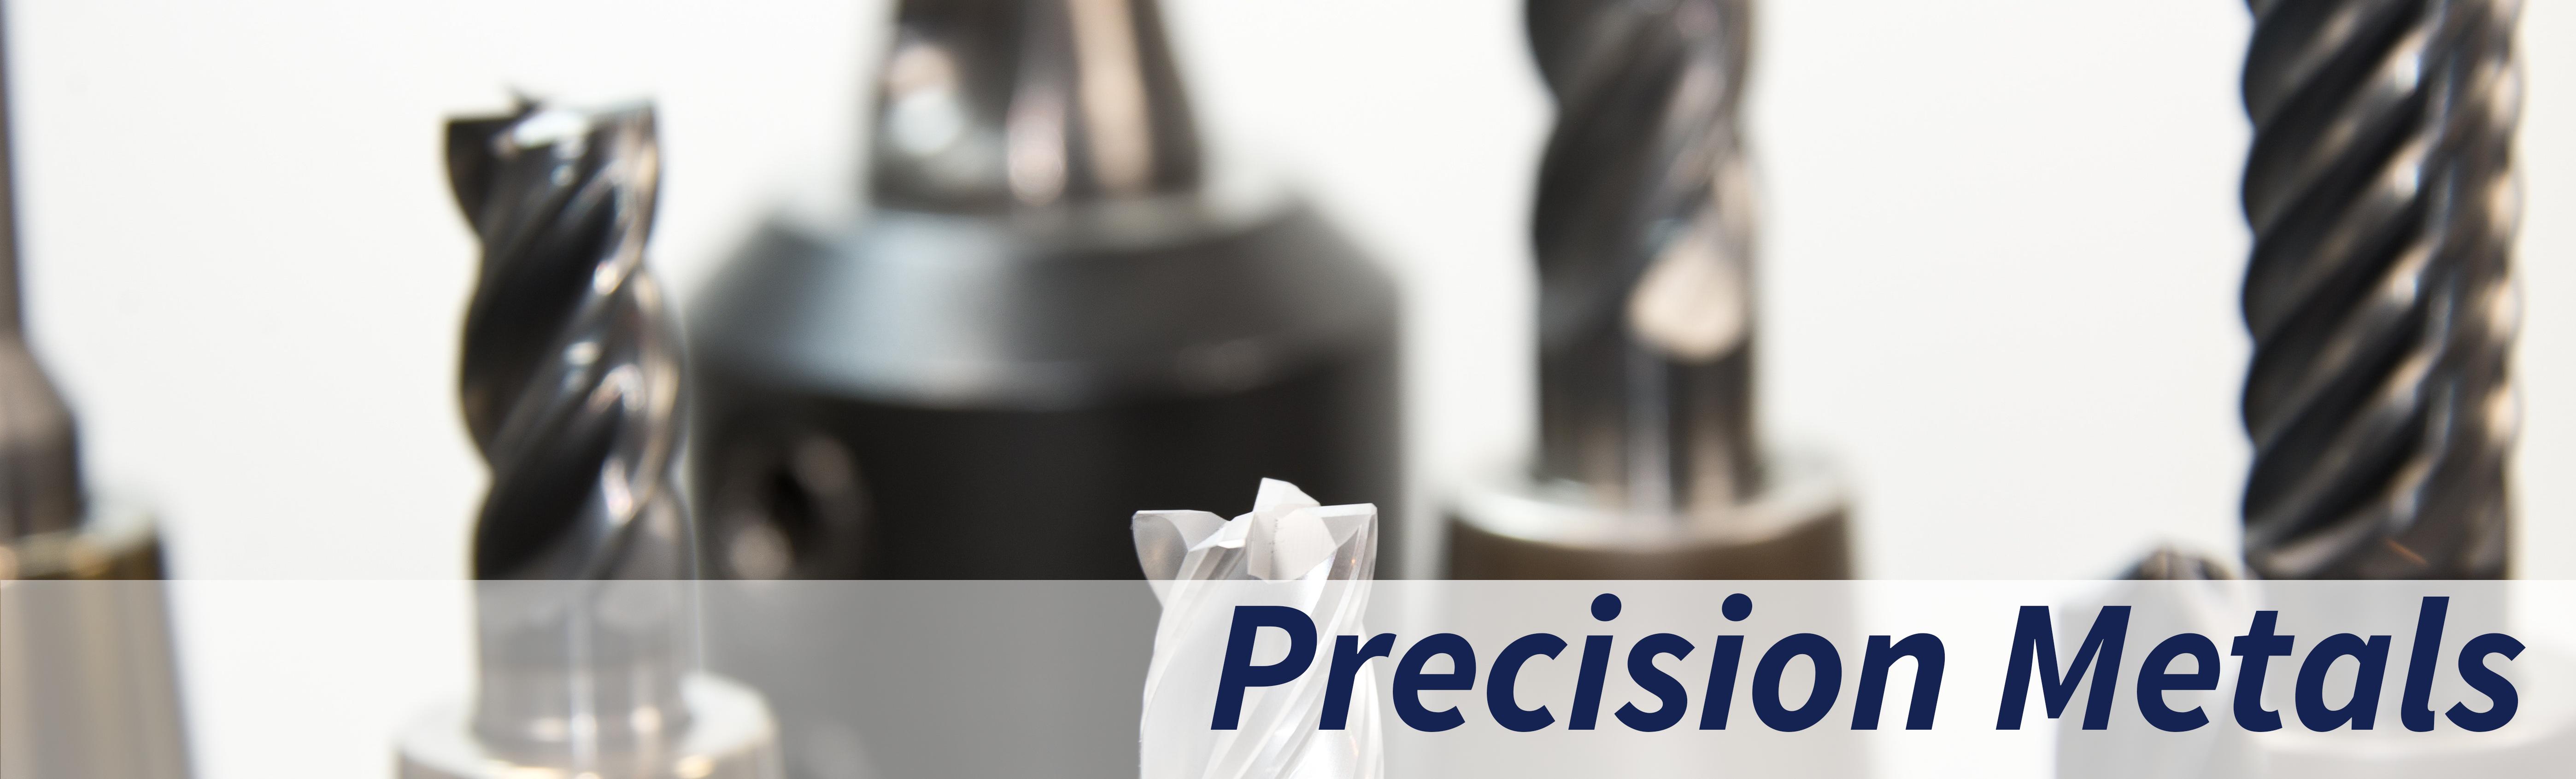 Precision Metals Banner